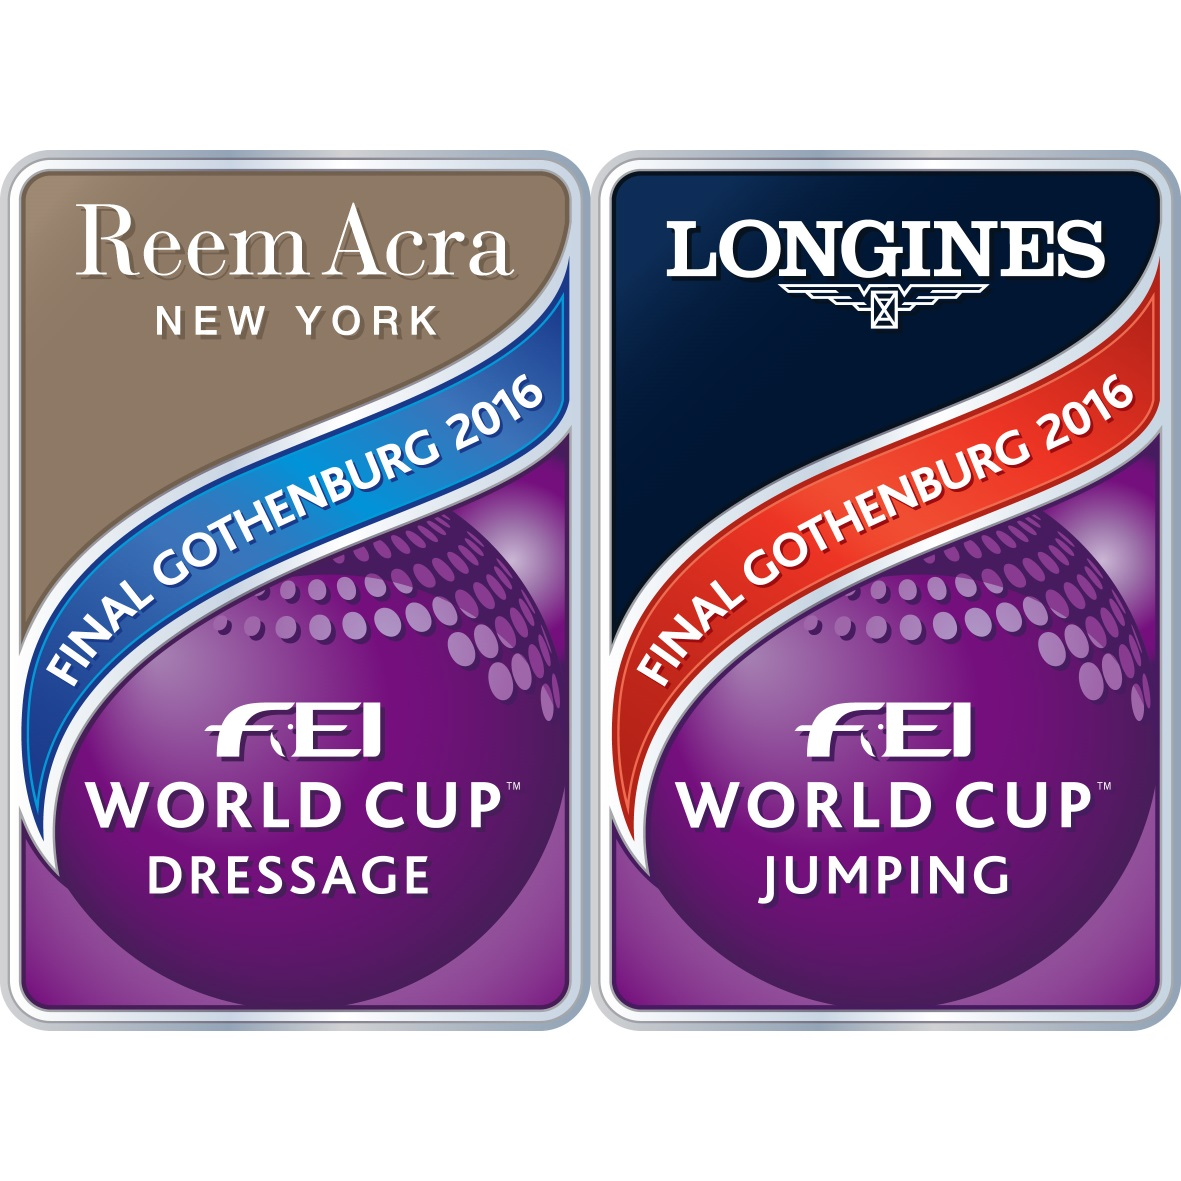 2016 Equestrian World Cup - Final